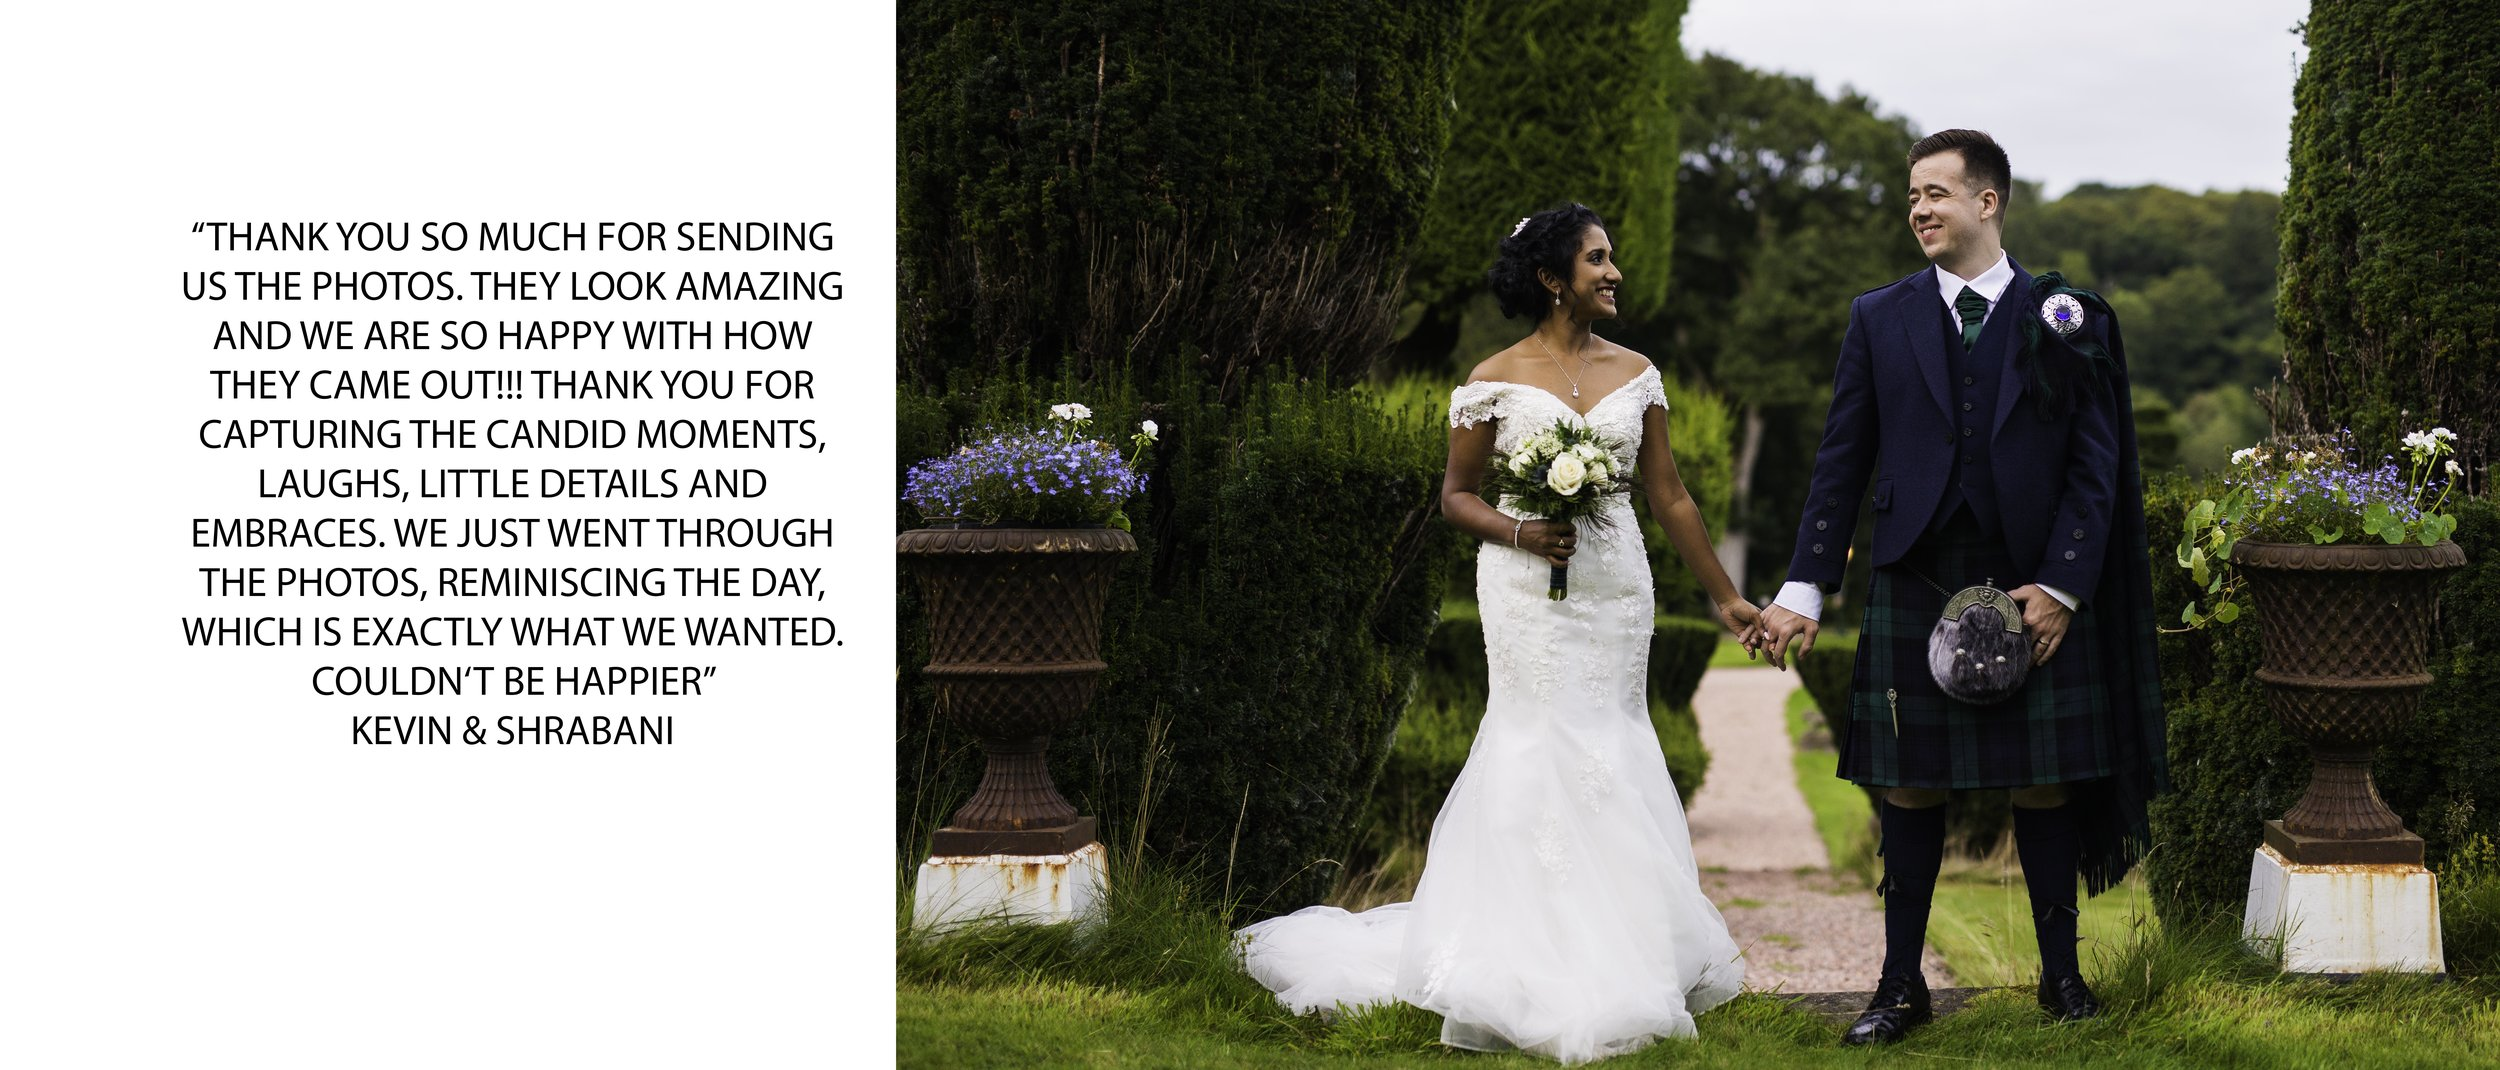 Nottingham wedding photographer review.jpg